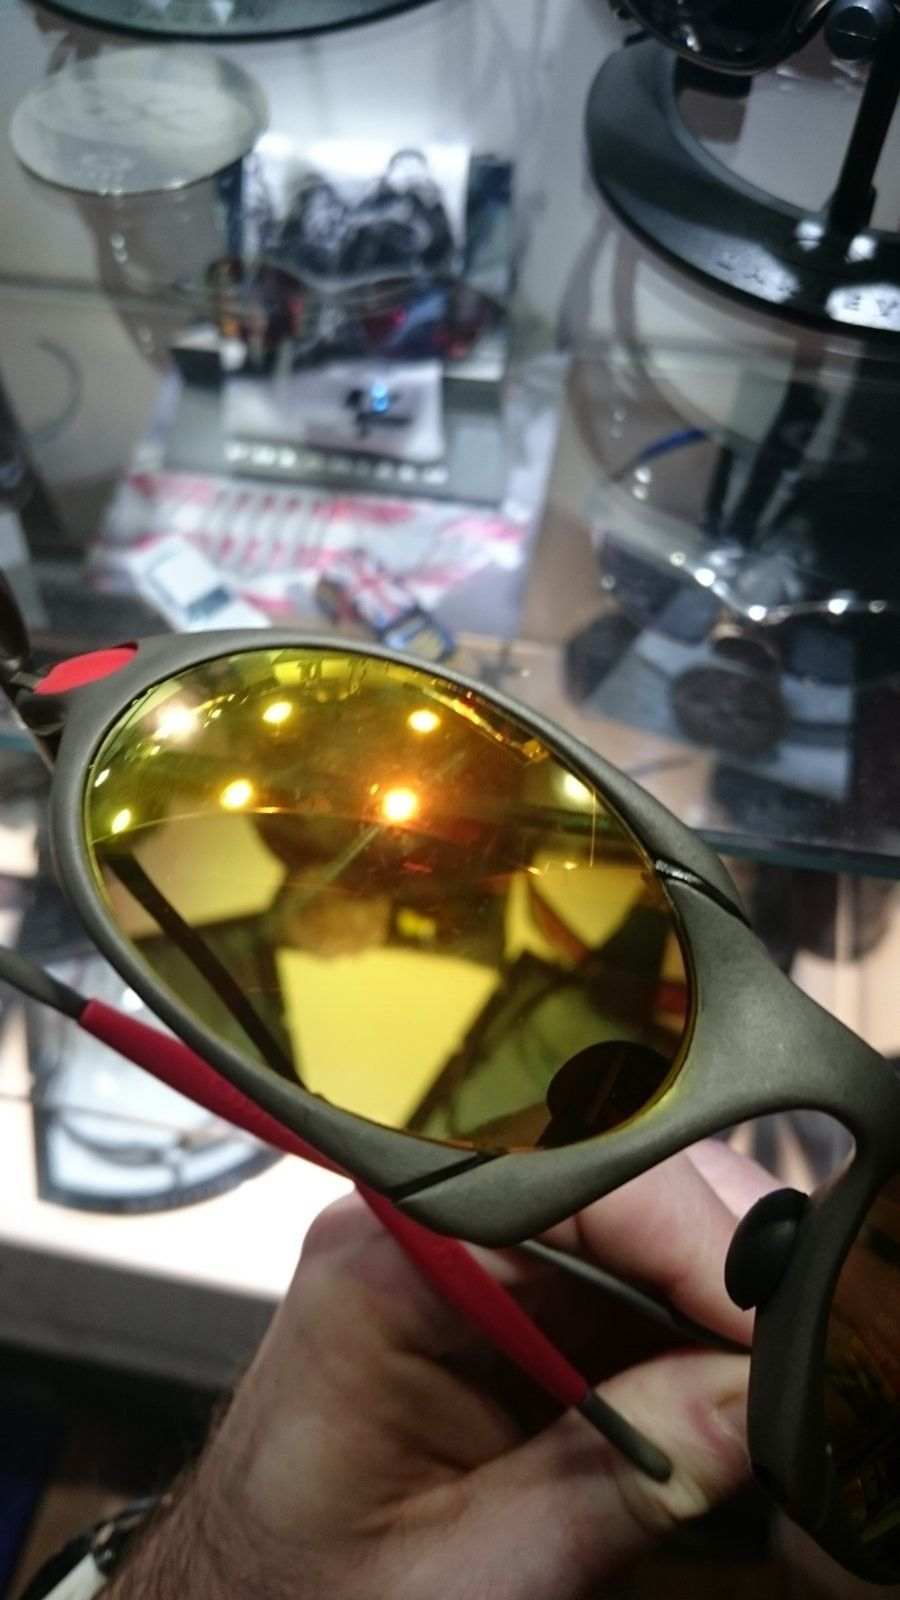 X-metal R1 with 2 sets of OEM lenses - DSC_0054.JPG